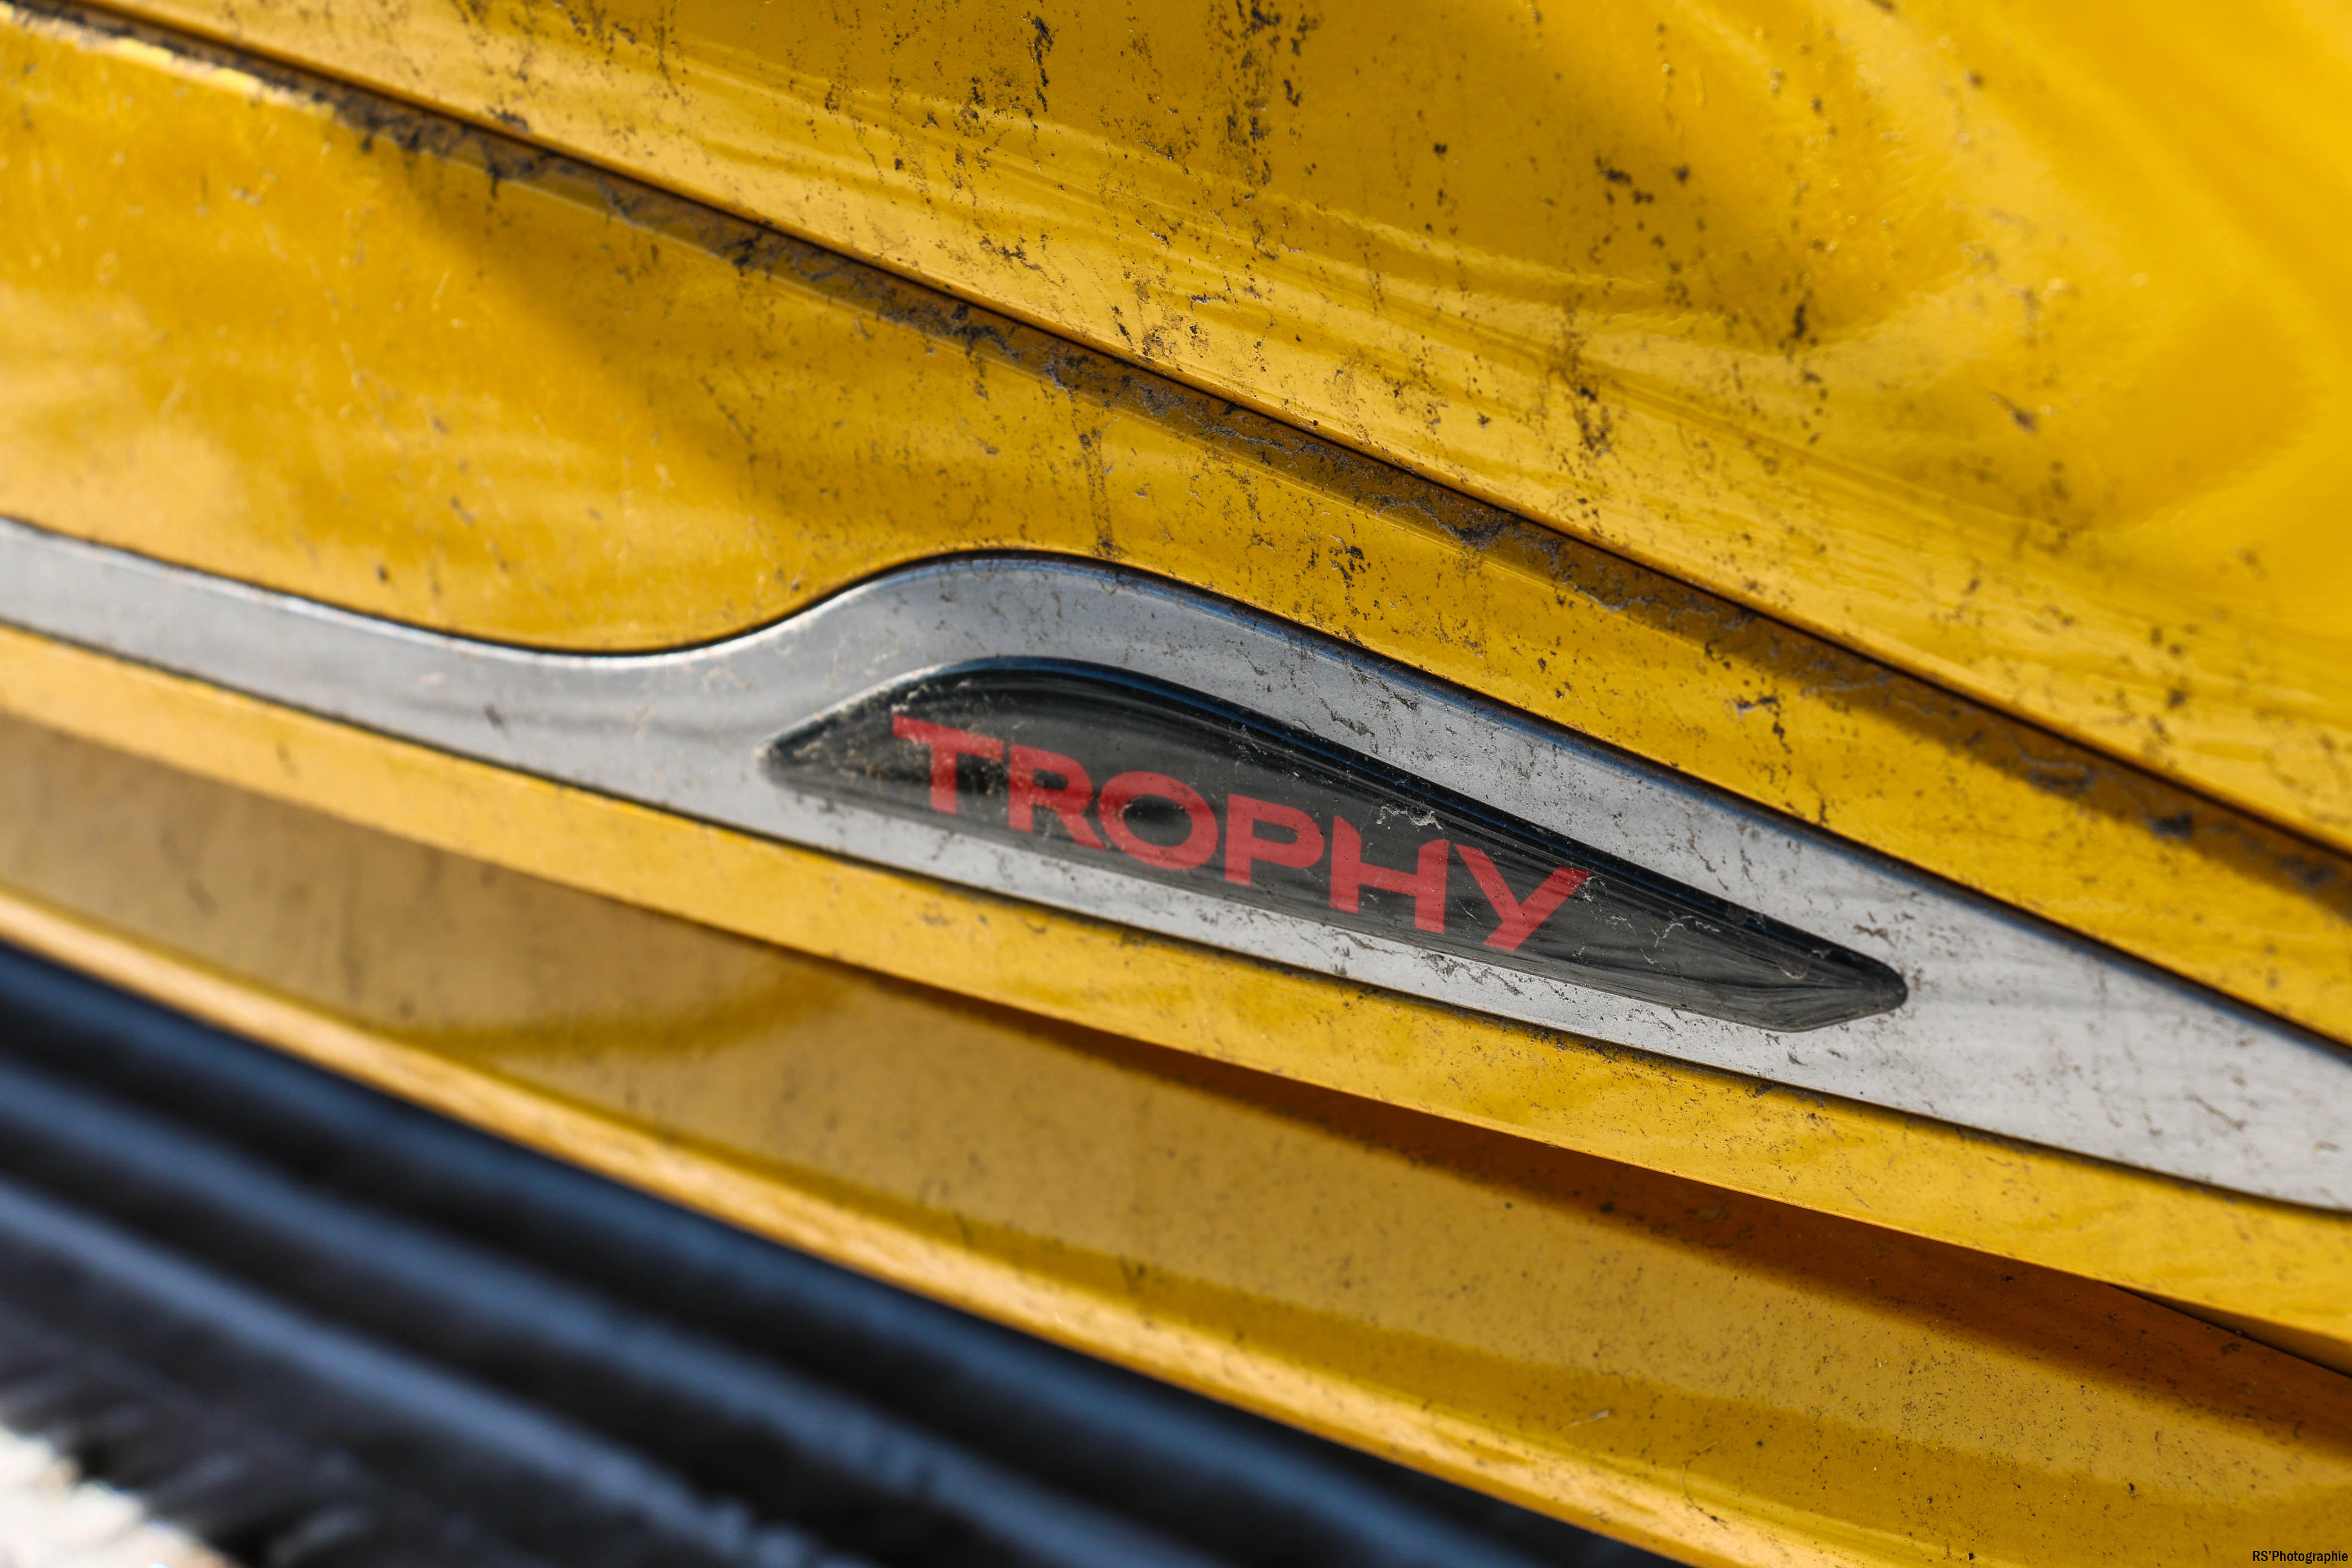 RenaultclioIVRSTrophy25-renault-clio-RS-trophy-logo-Arnaud Demasier-RSPhotographie